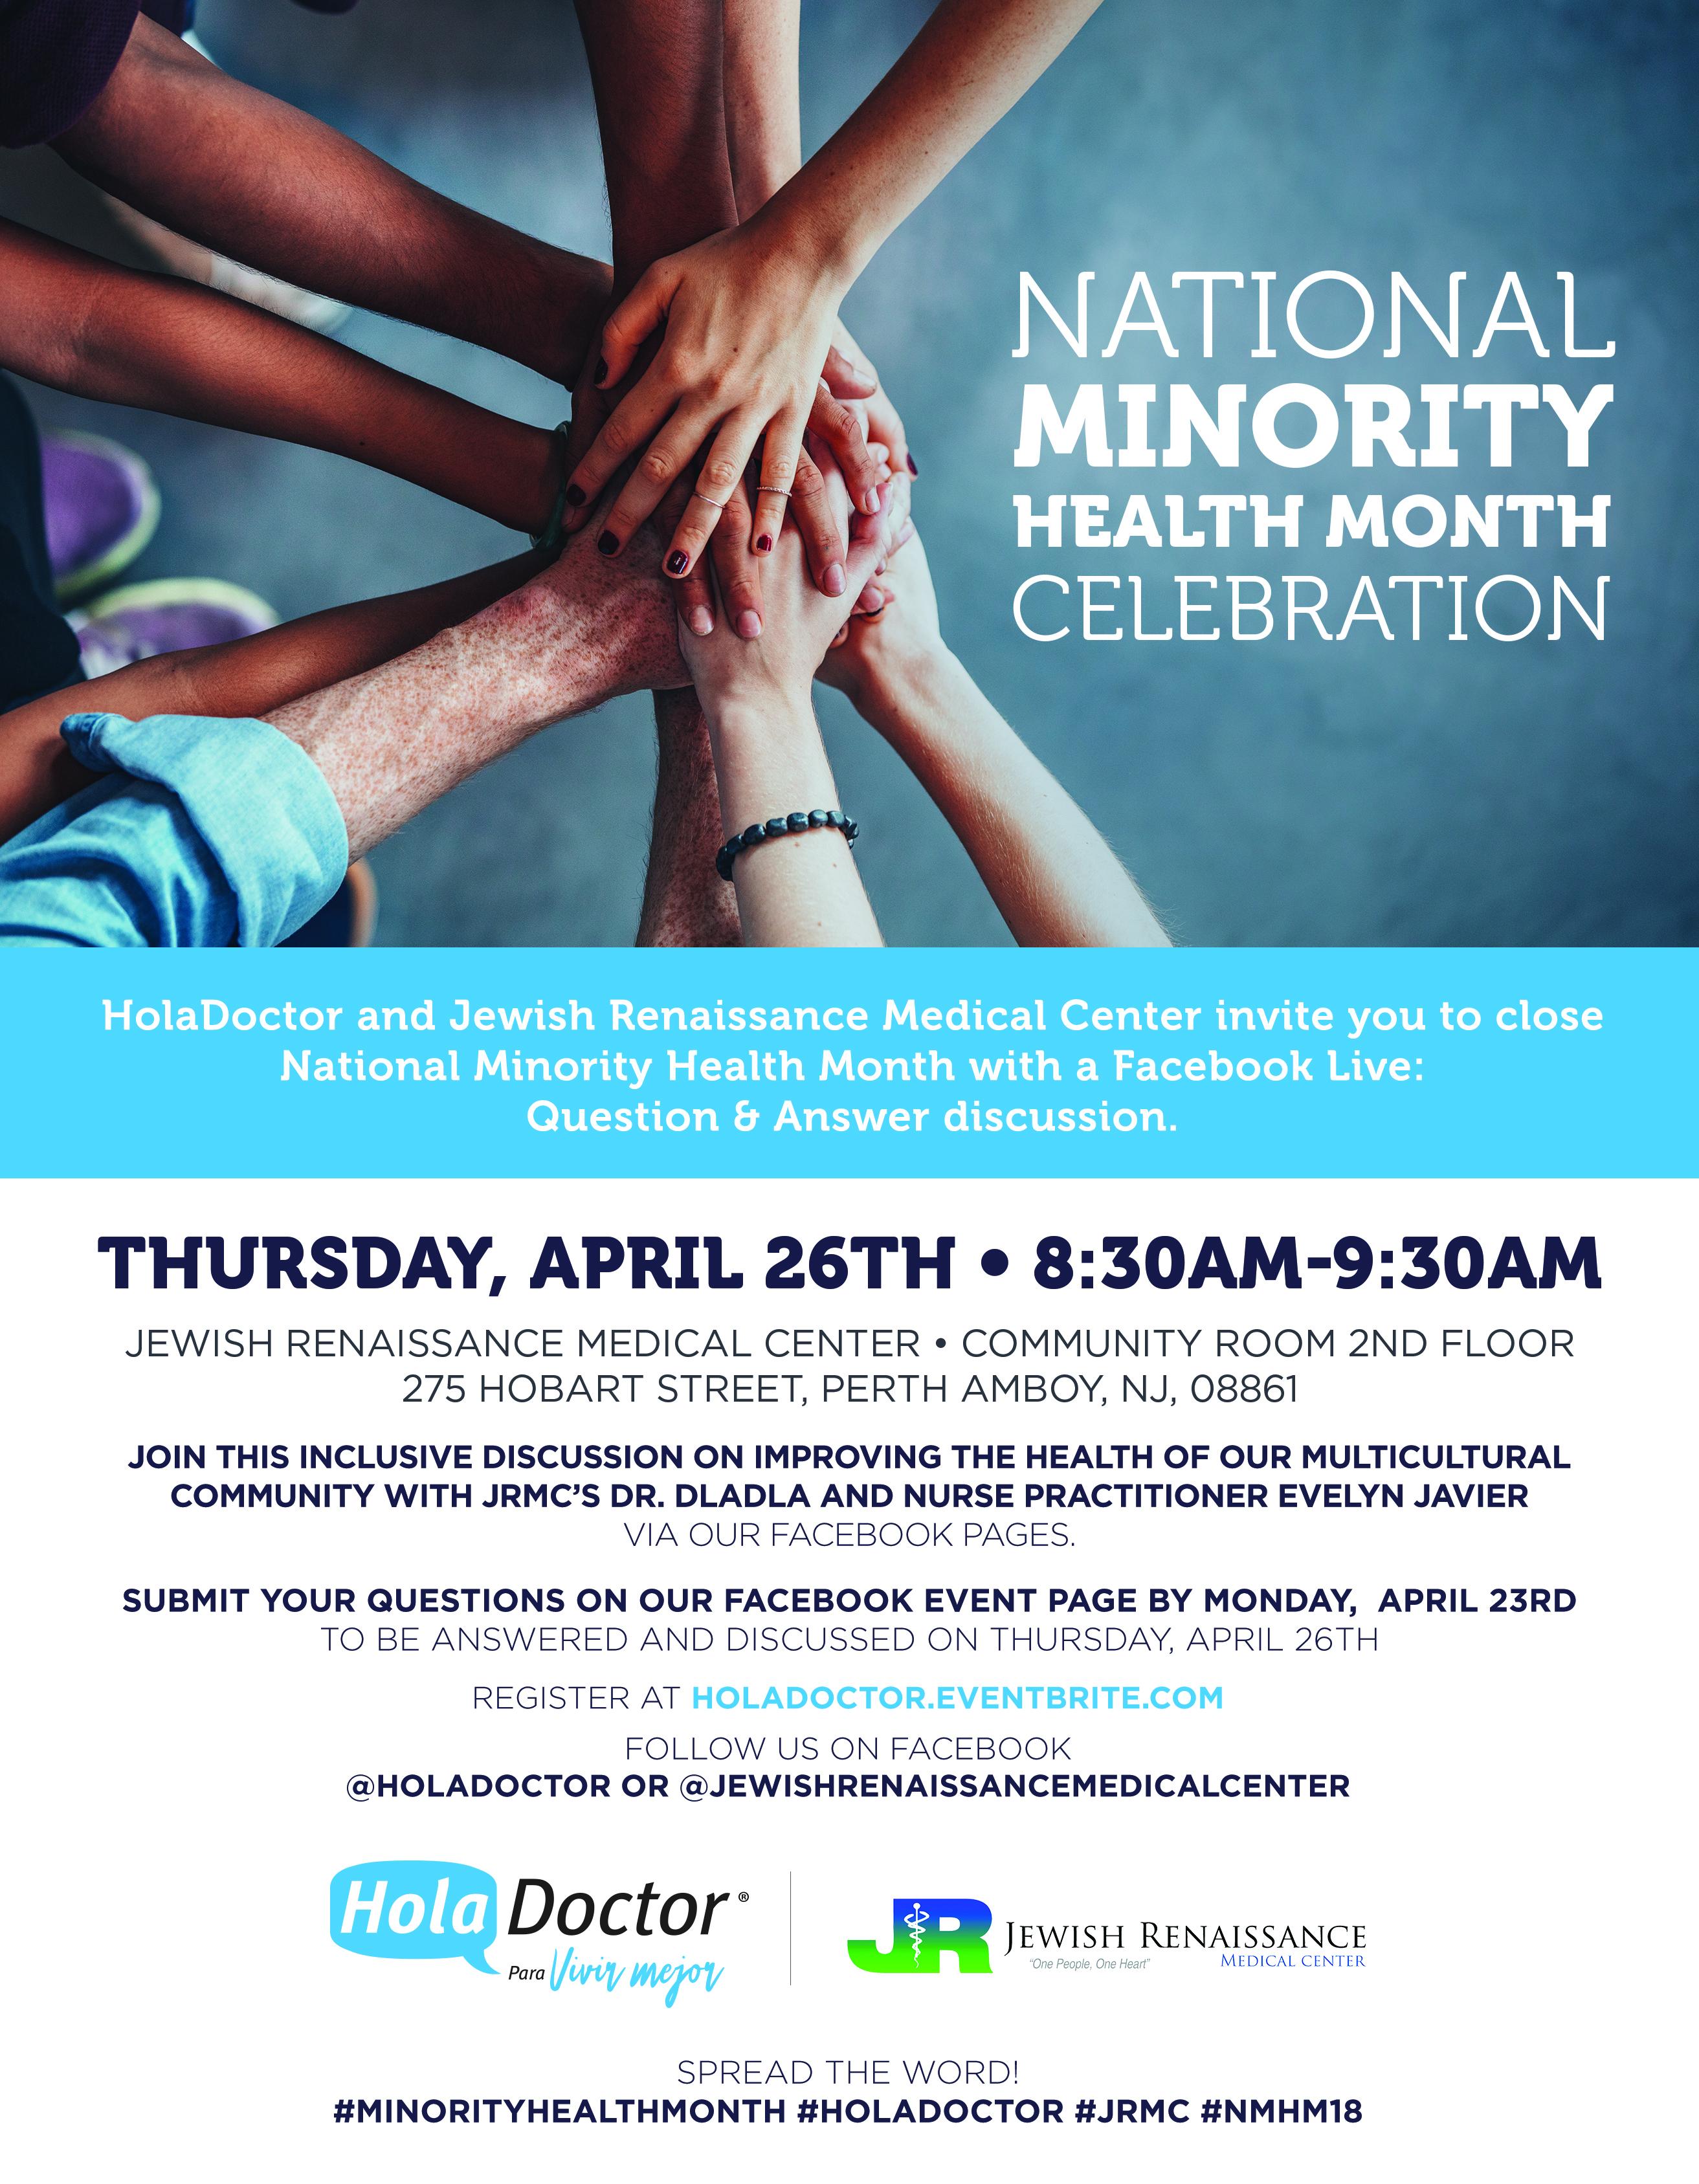 National Minority Health Month Celebration